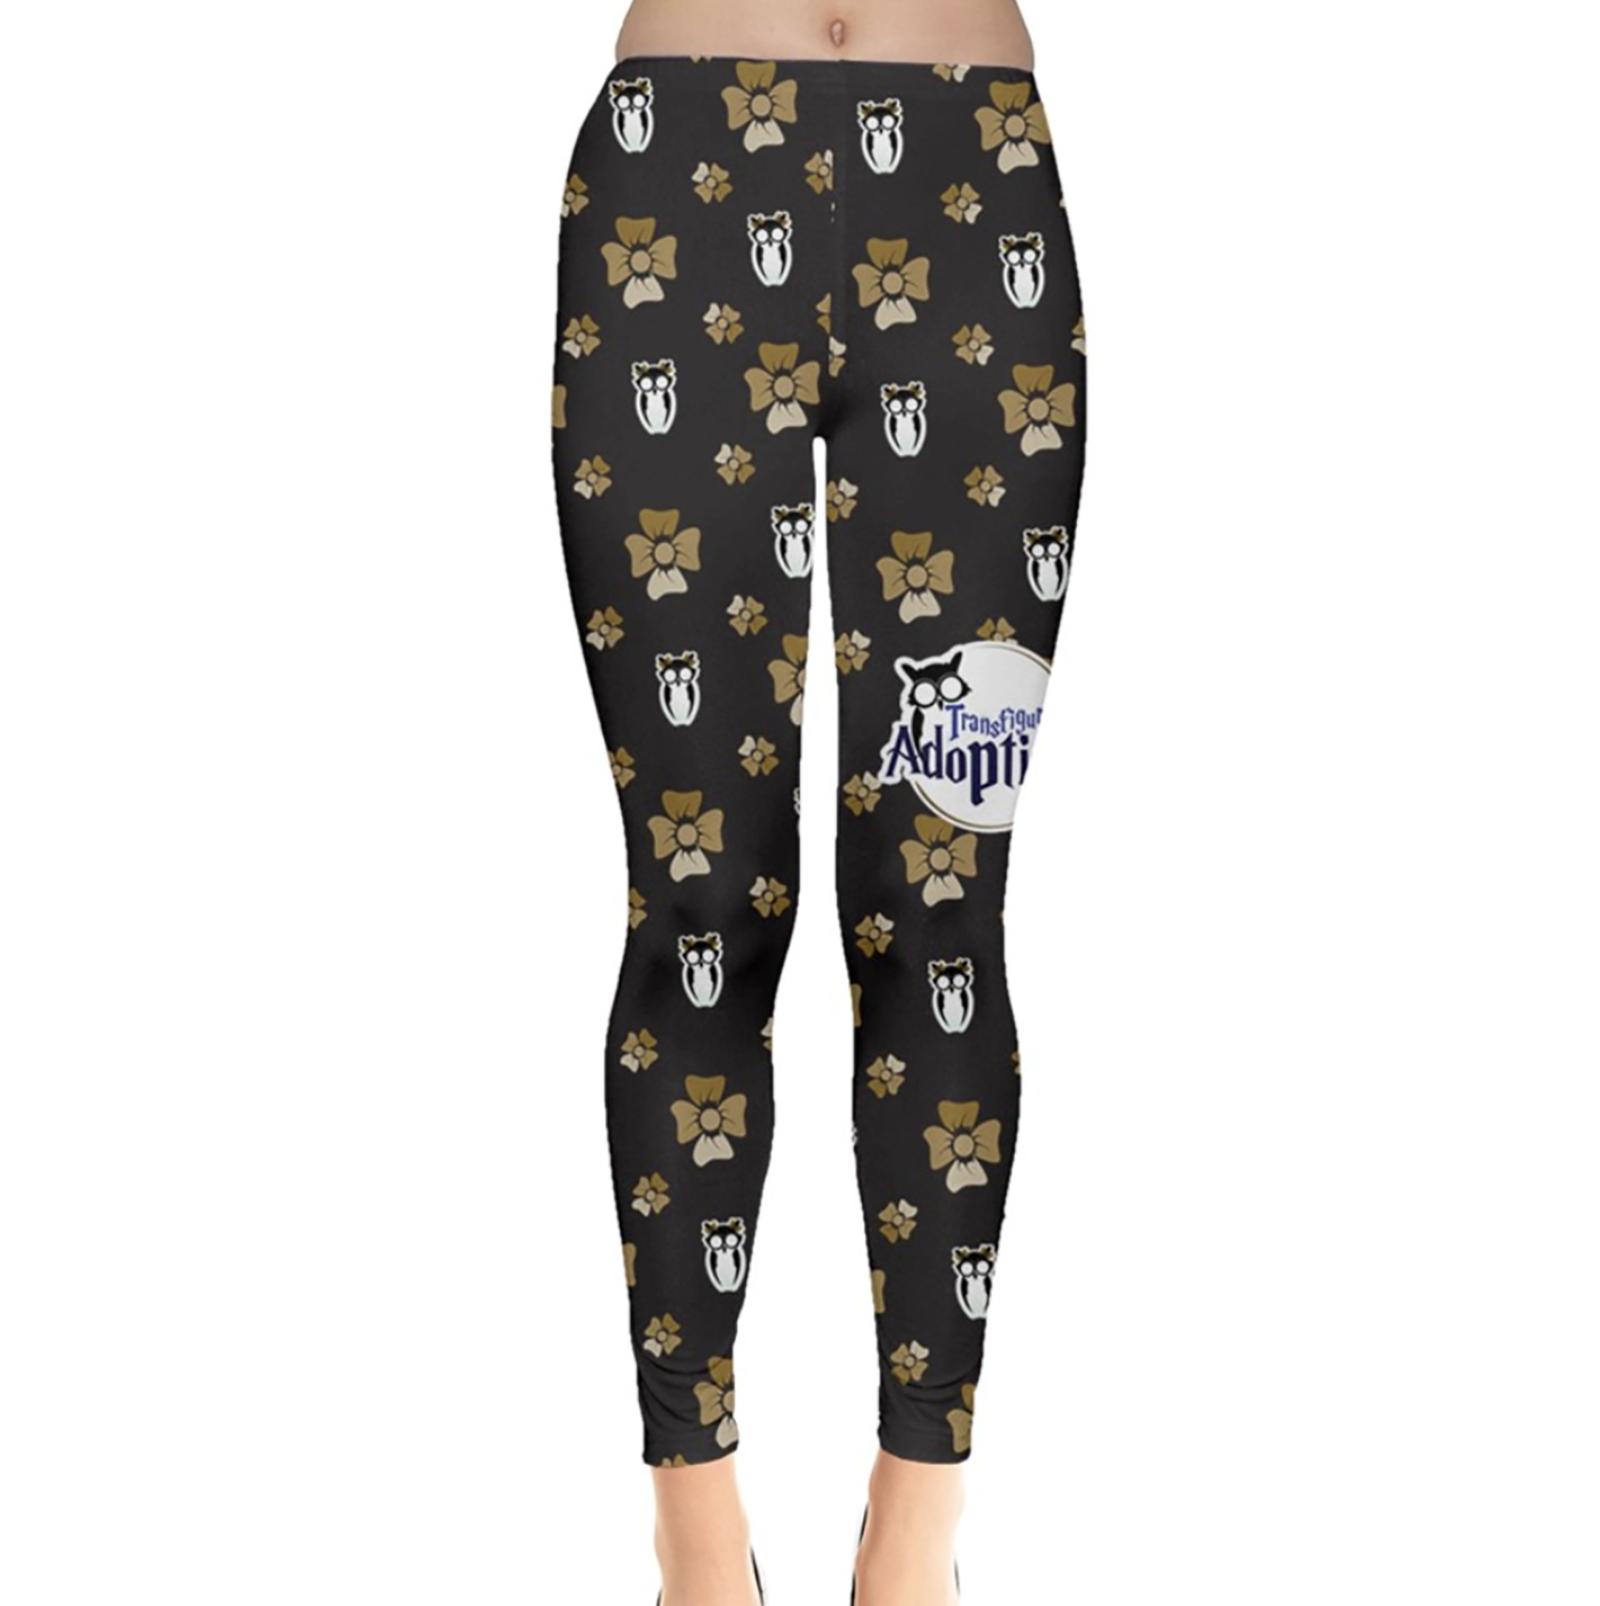 Yellow & Black Pattern Leggings - Inspired by Hufflepuff